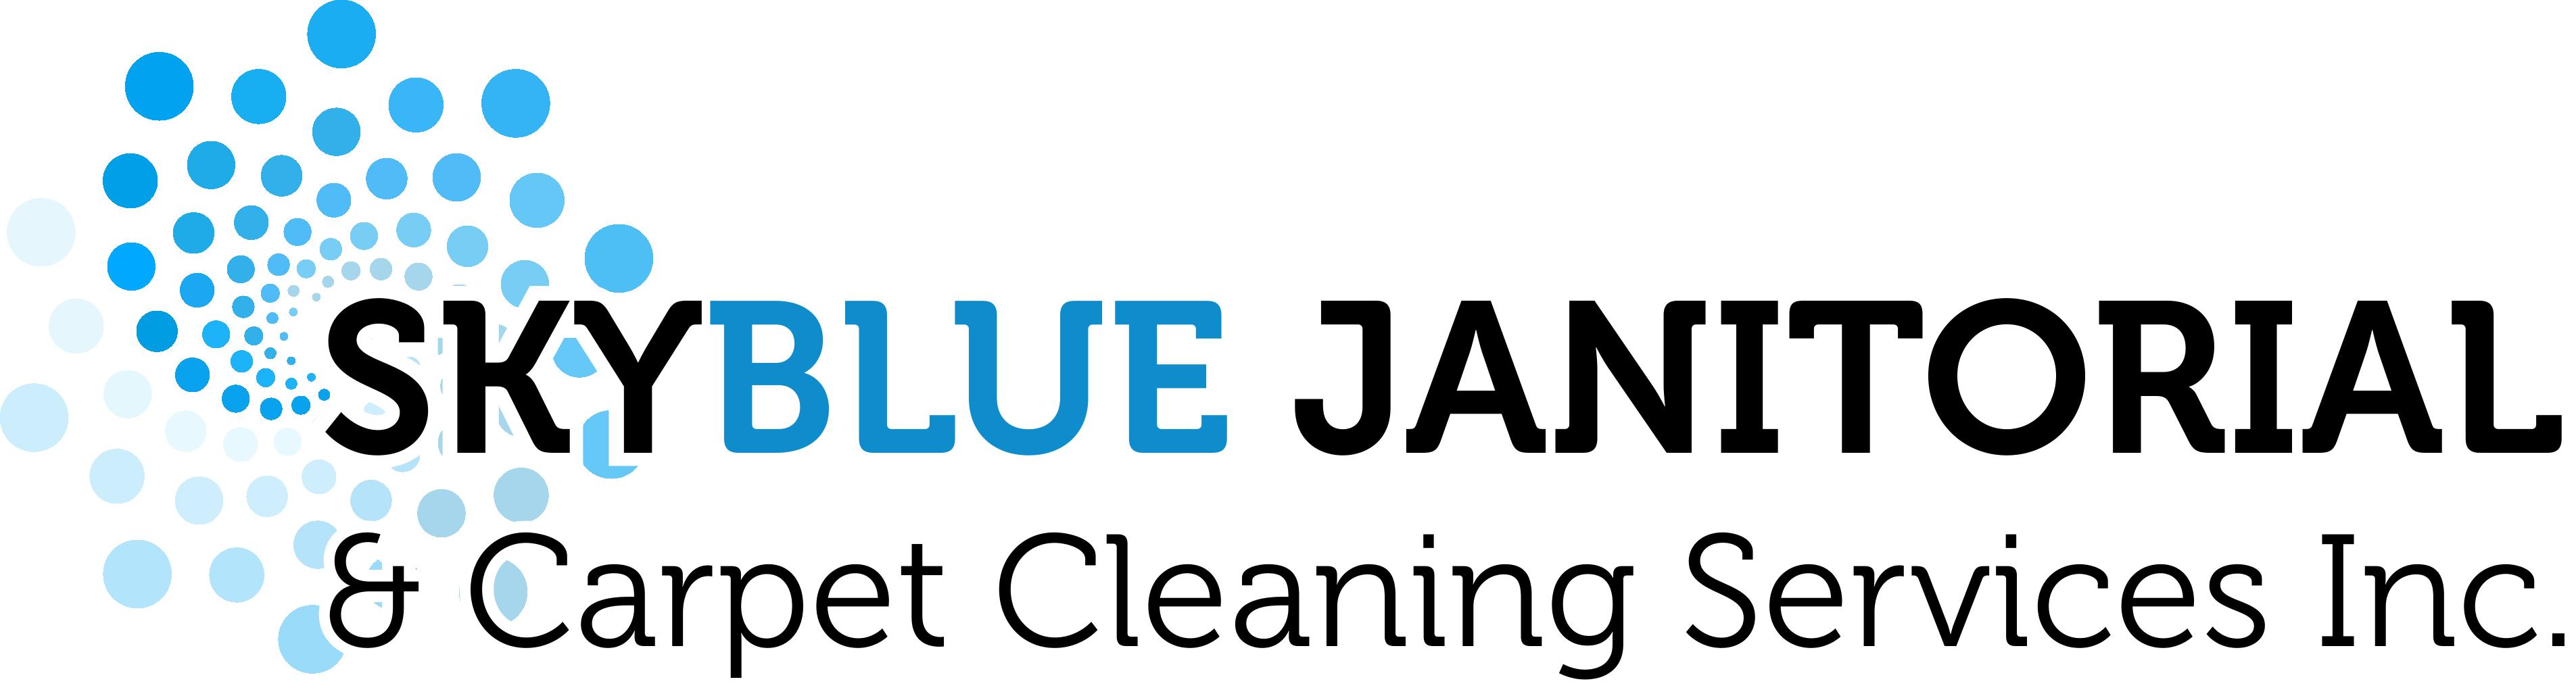 SBJ_logo3